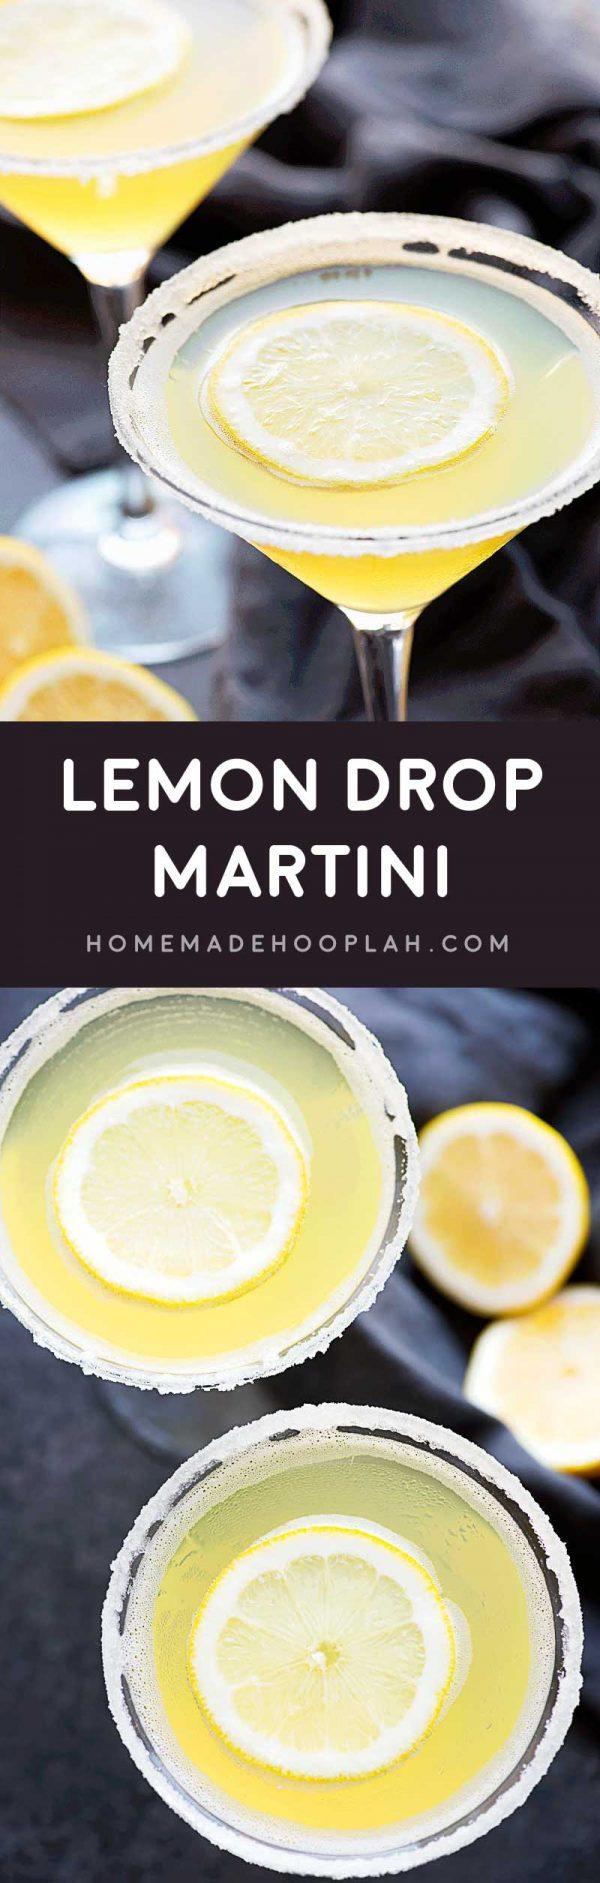 Lemon drop martini homemade hooplah for How to make flavored martinis